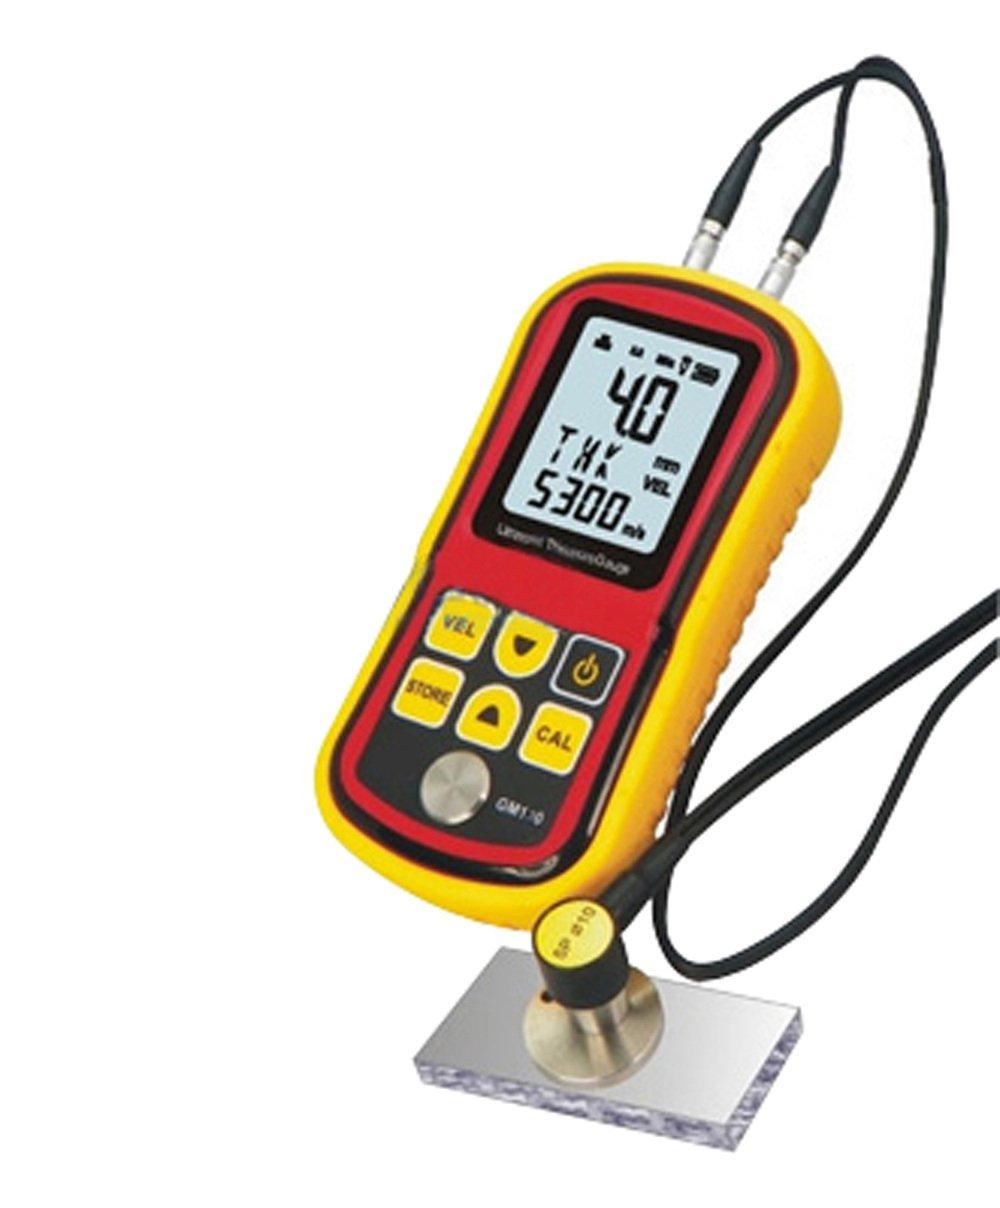 Sinotech Ultrasonic Thickness Gauge Sk130